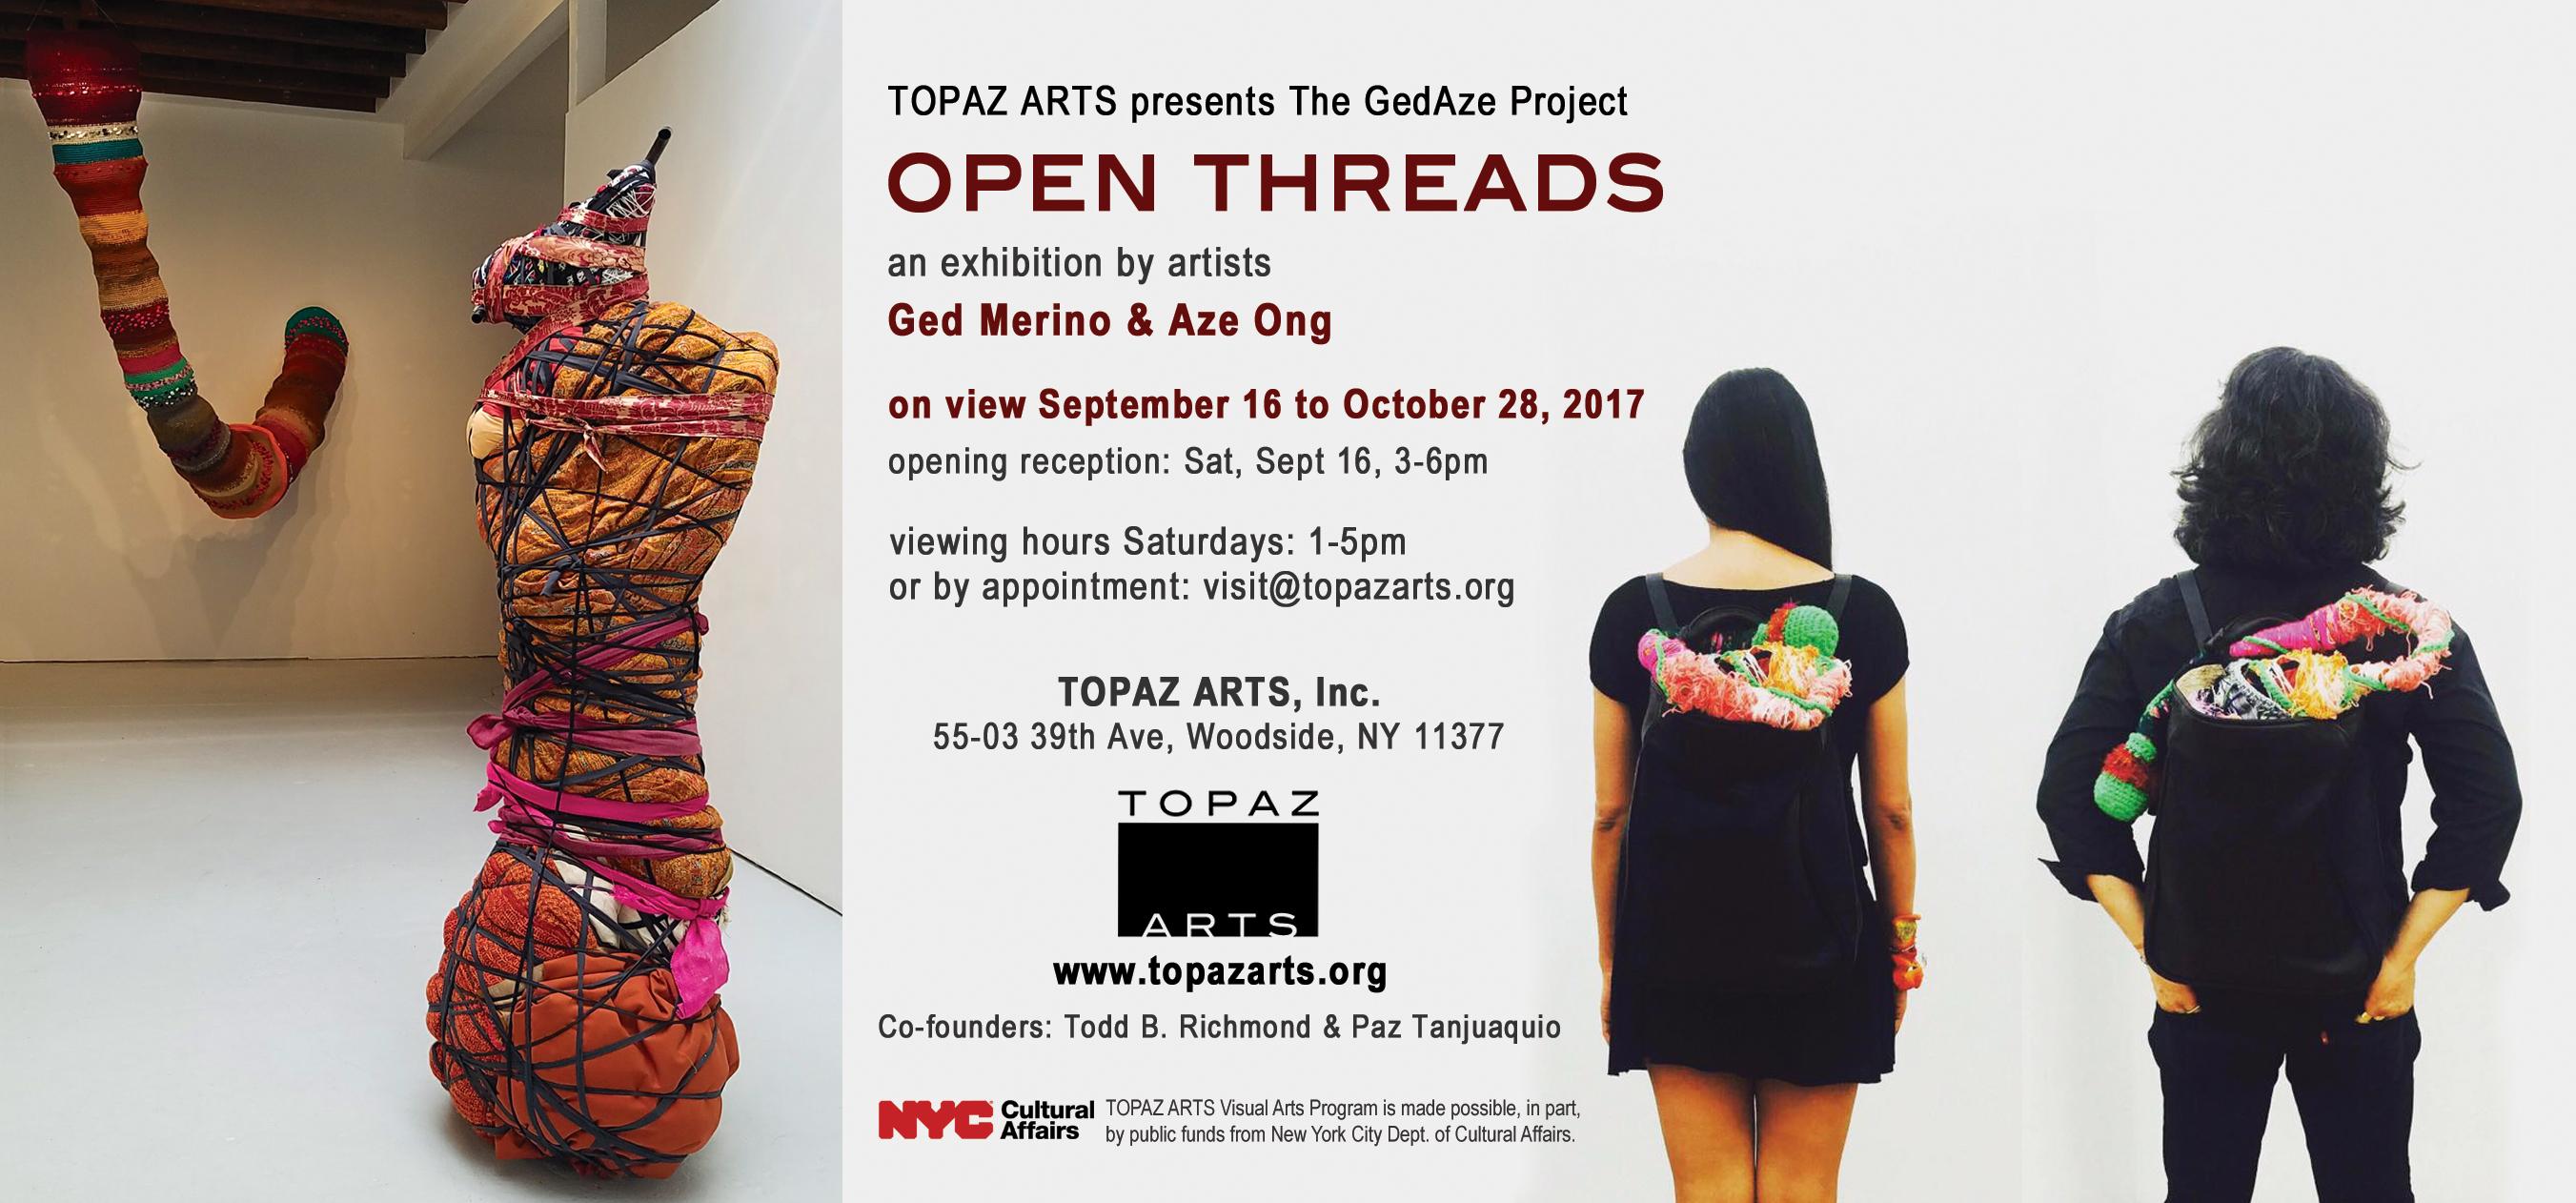 TOPAZ ARTS, Inc.: slideshow image 1